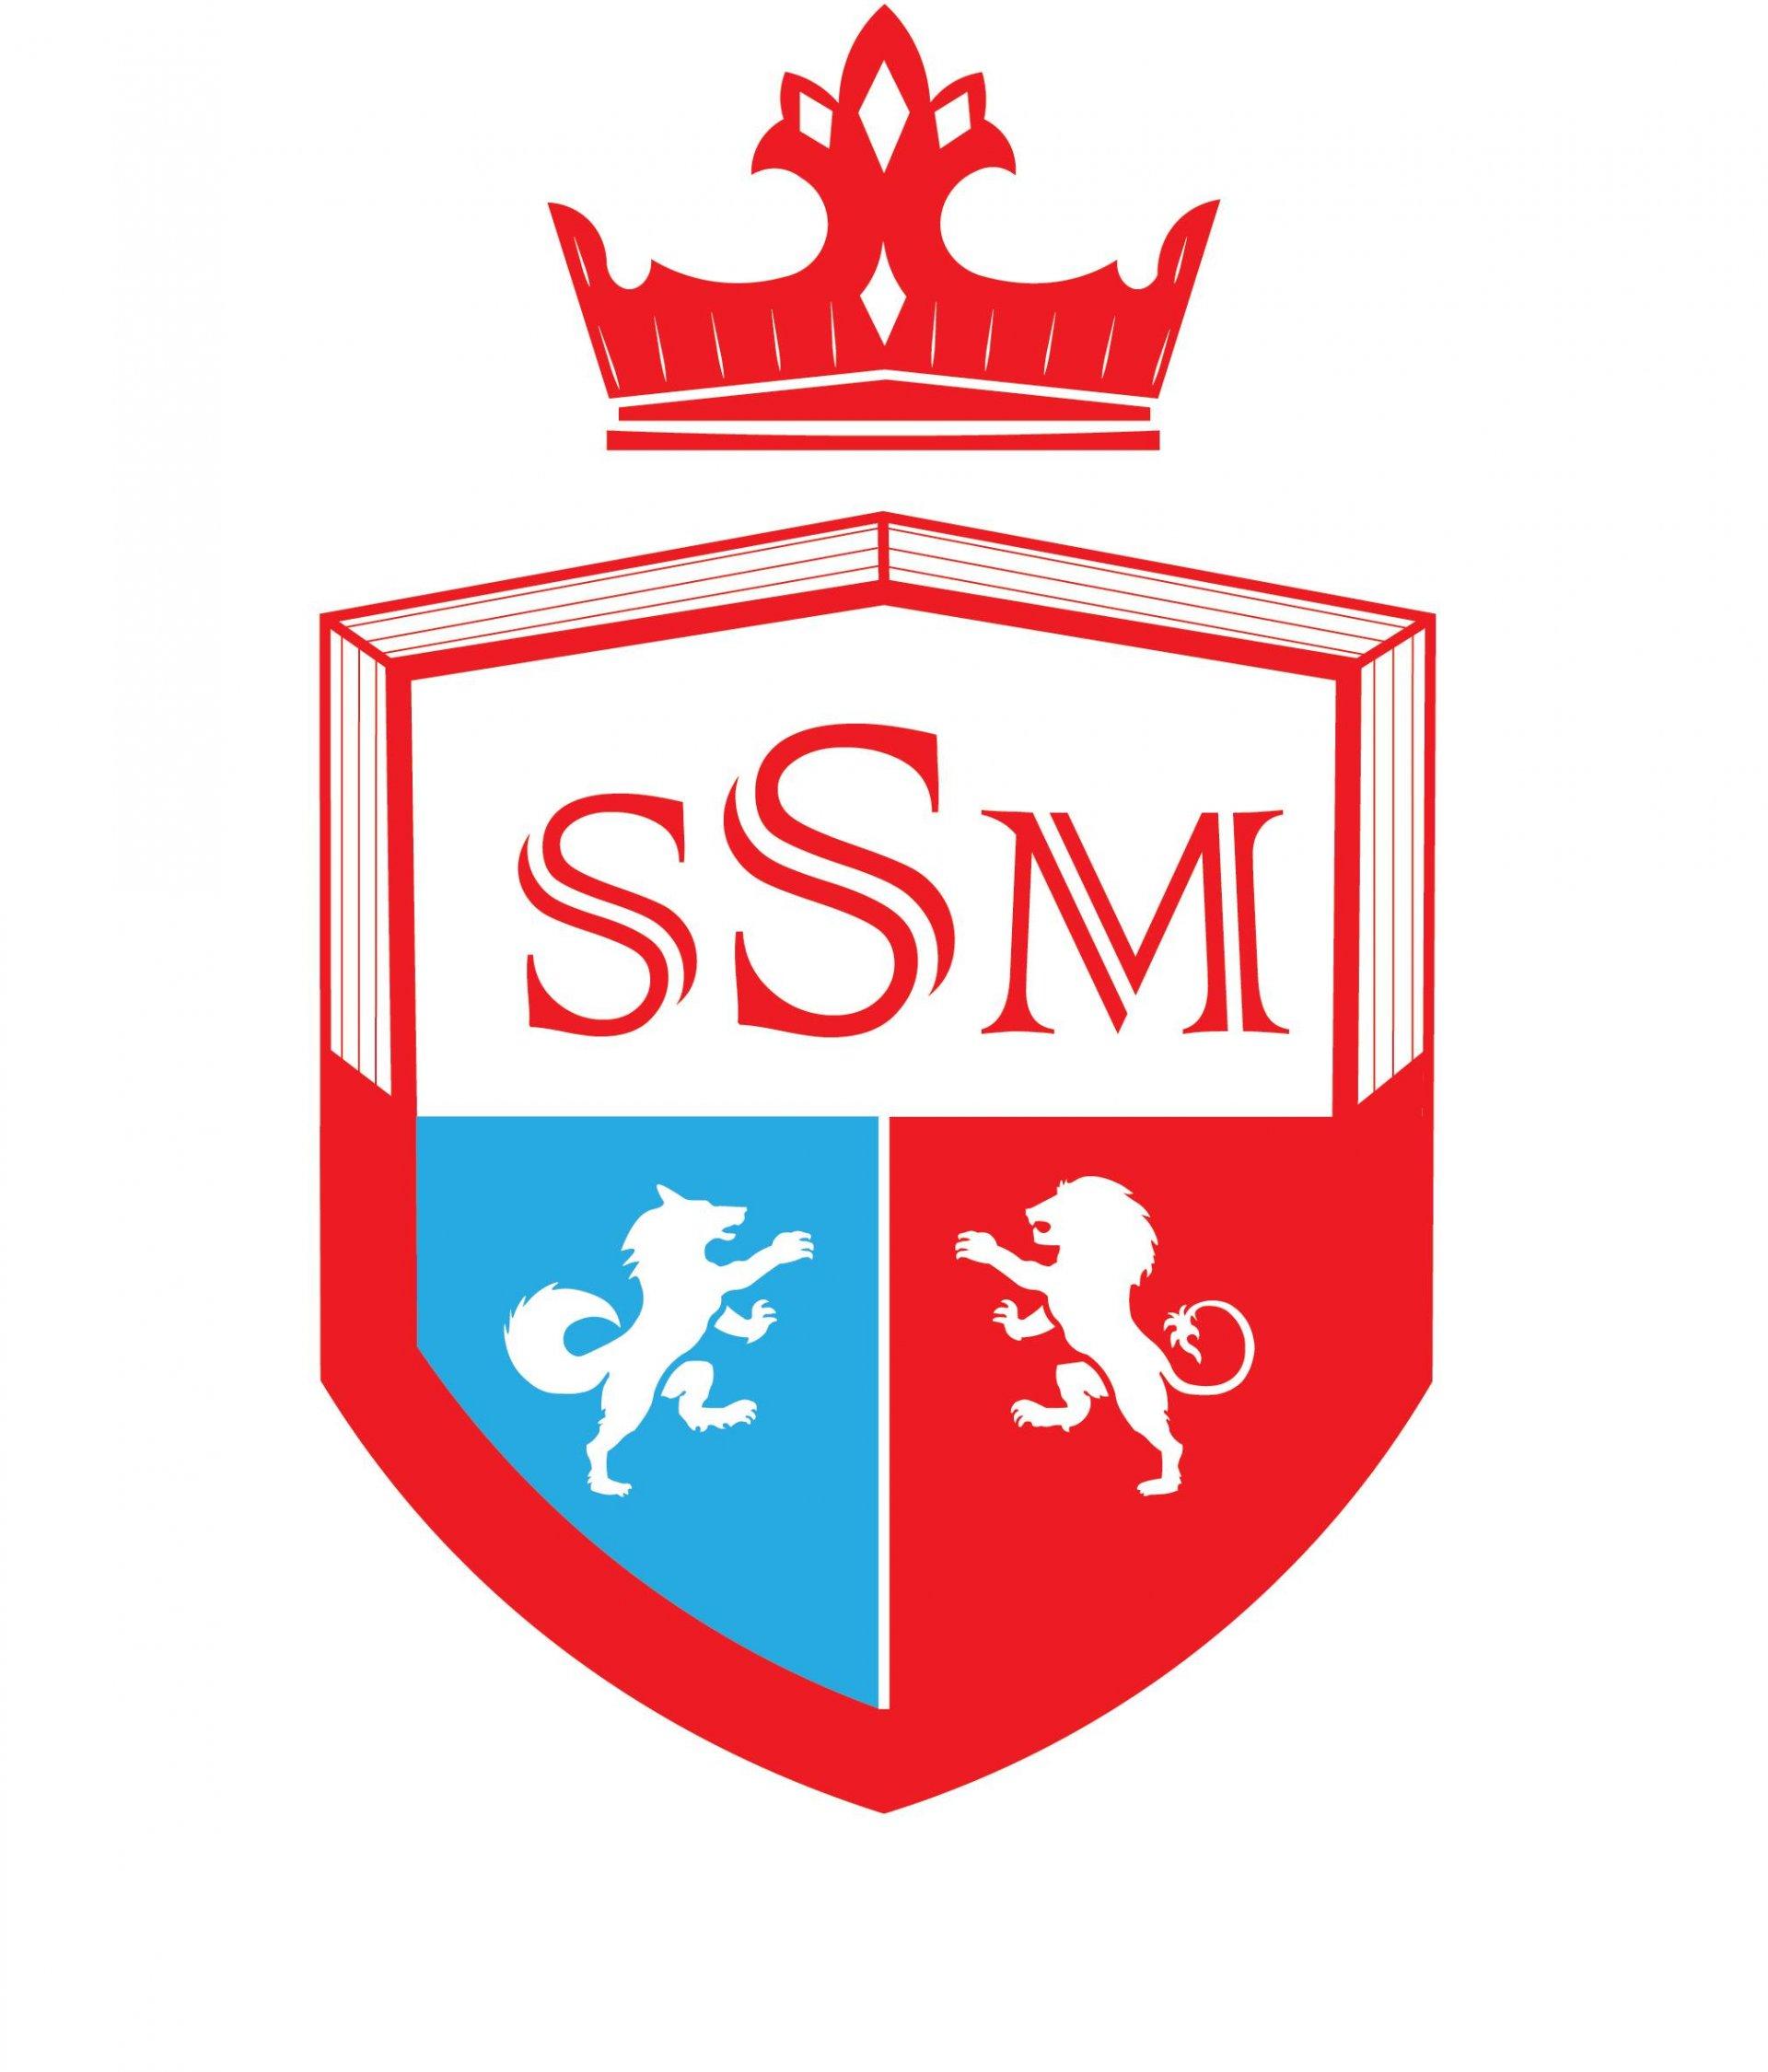 English Teachers' professional development session... JnrLink franchise english program in SSM